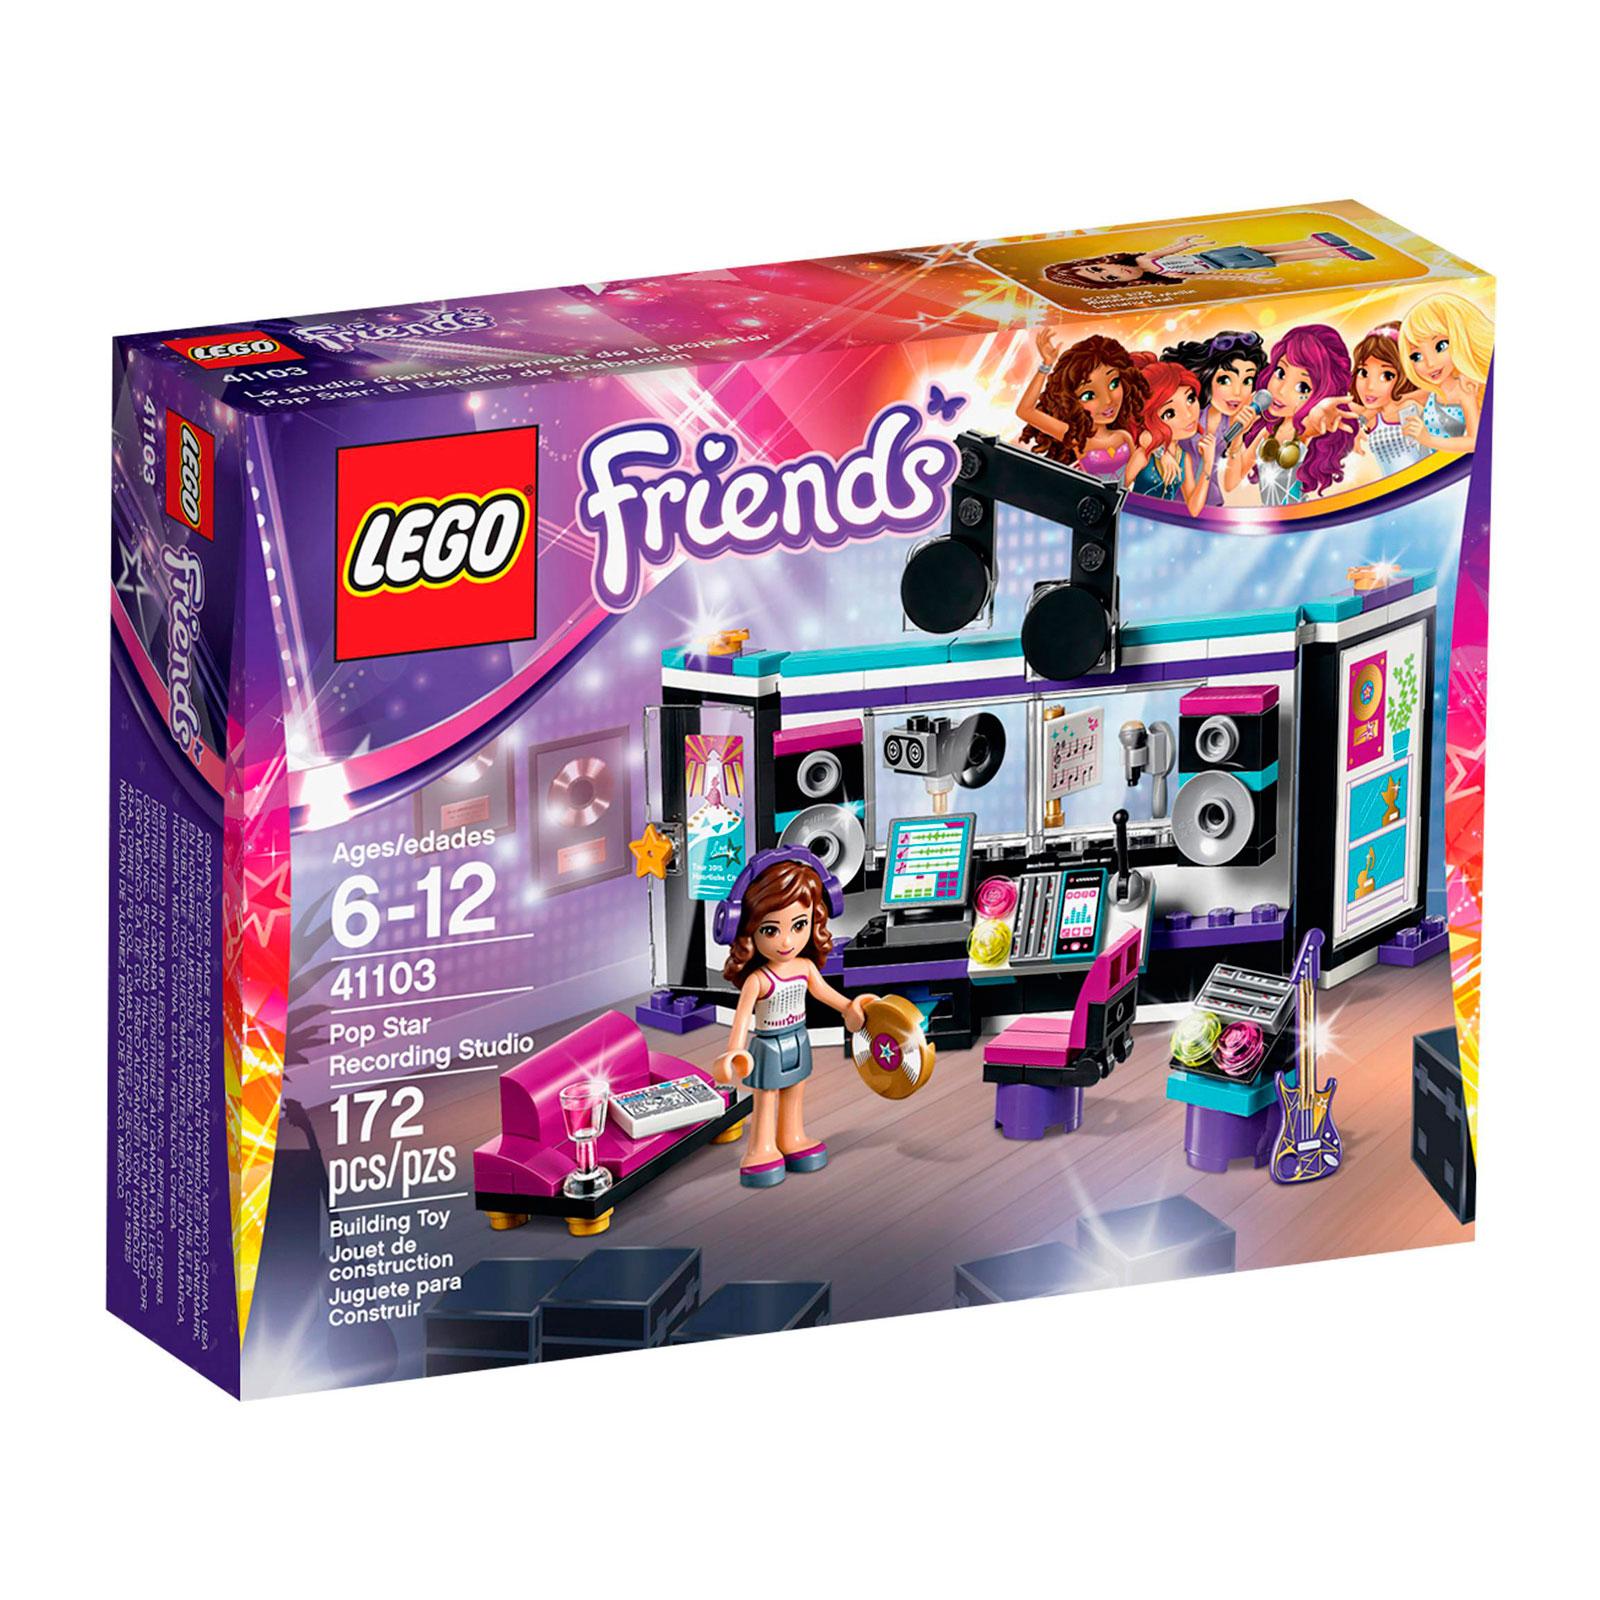 ����������� LEGO Friends 41103 ��� ������: ������ �����������